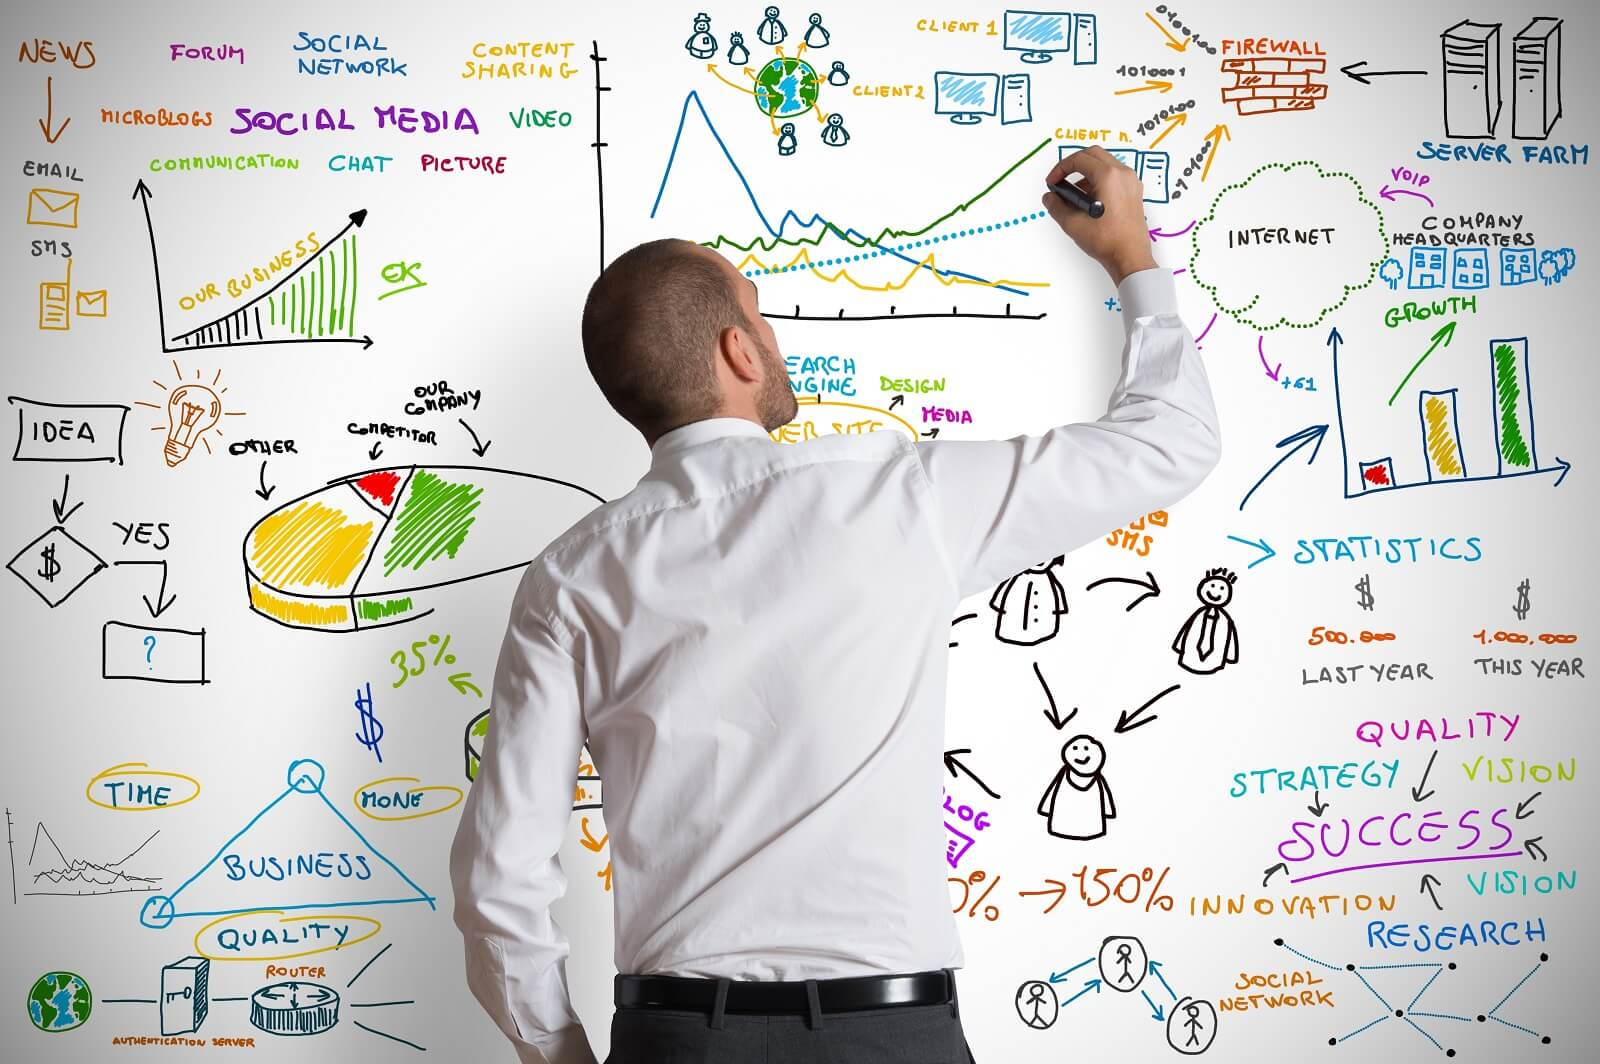 Mieux comprendre l'inbound marketing et l'outbound marketing